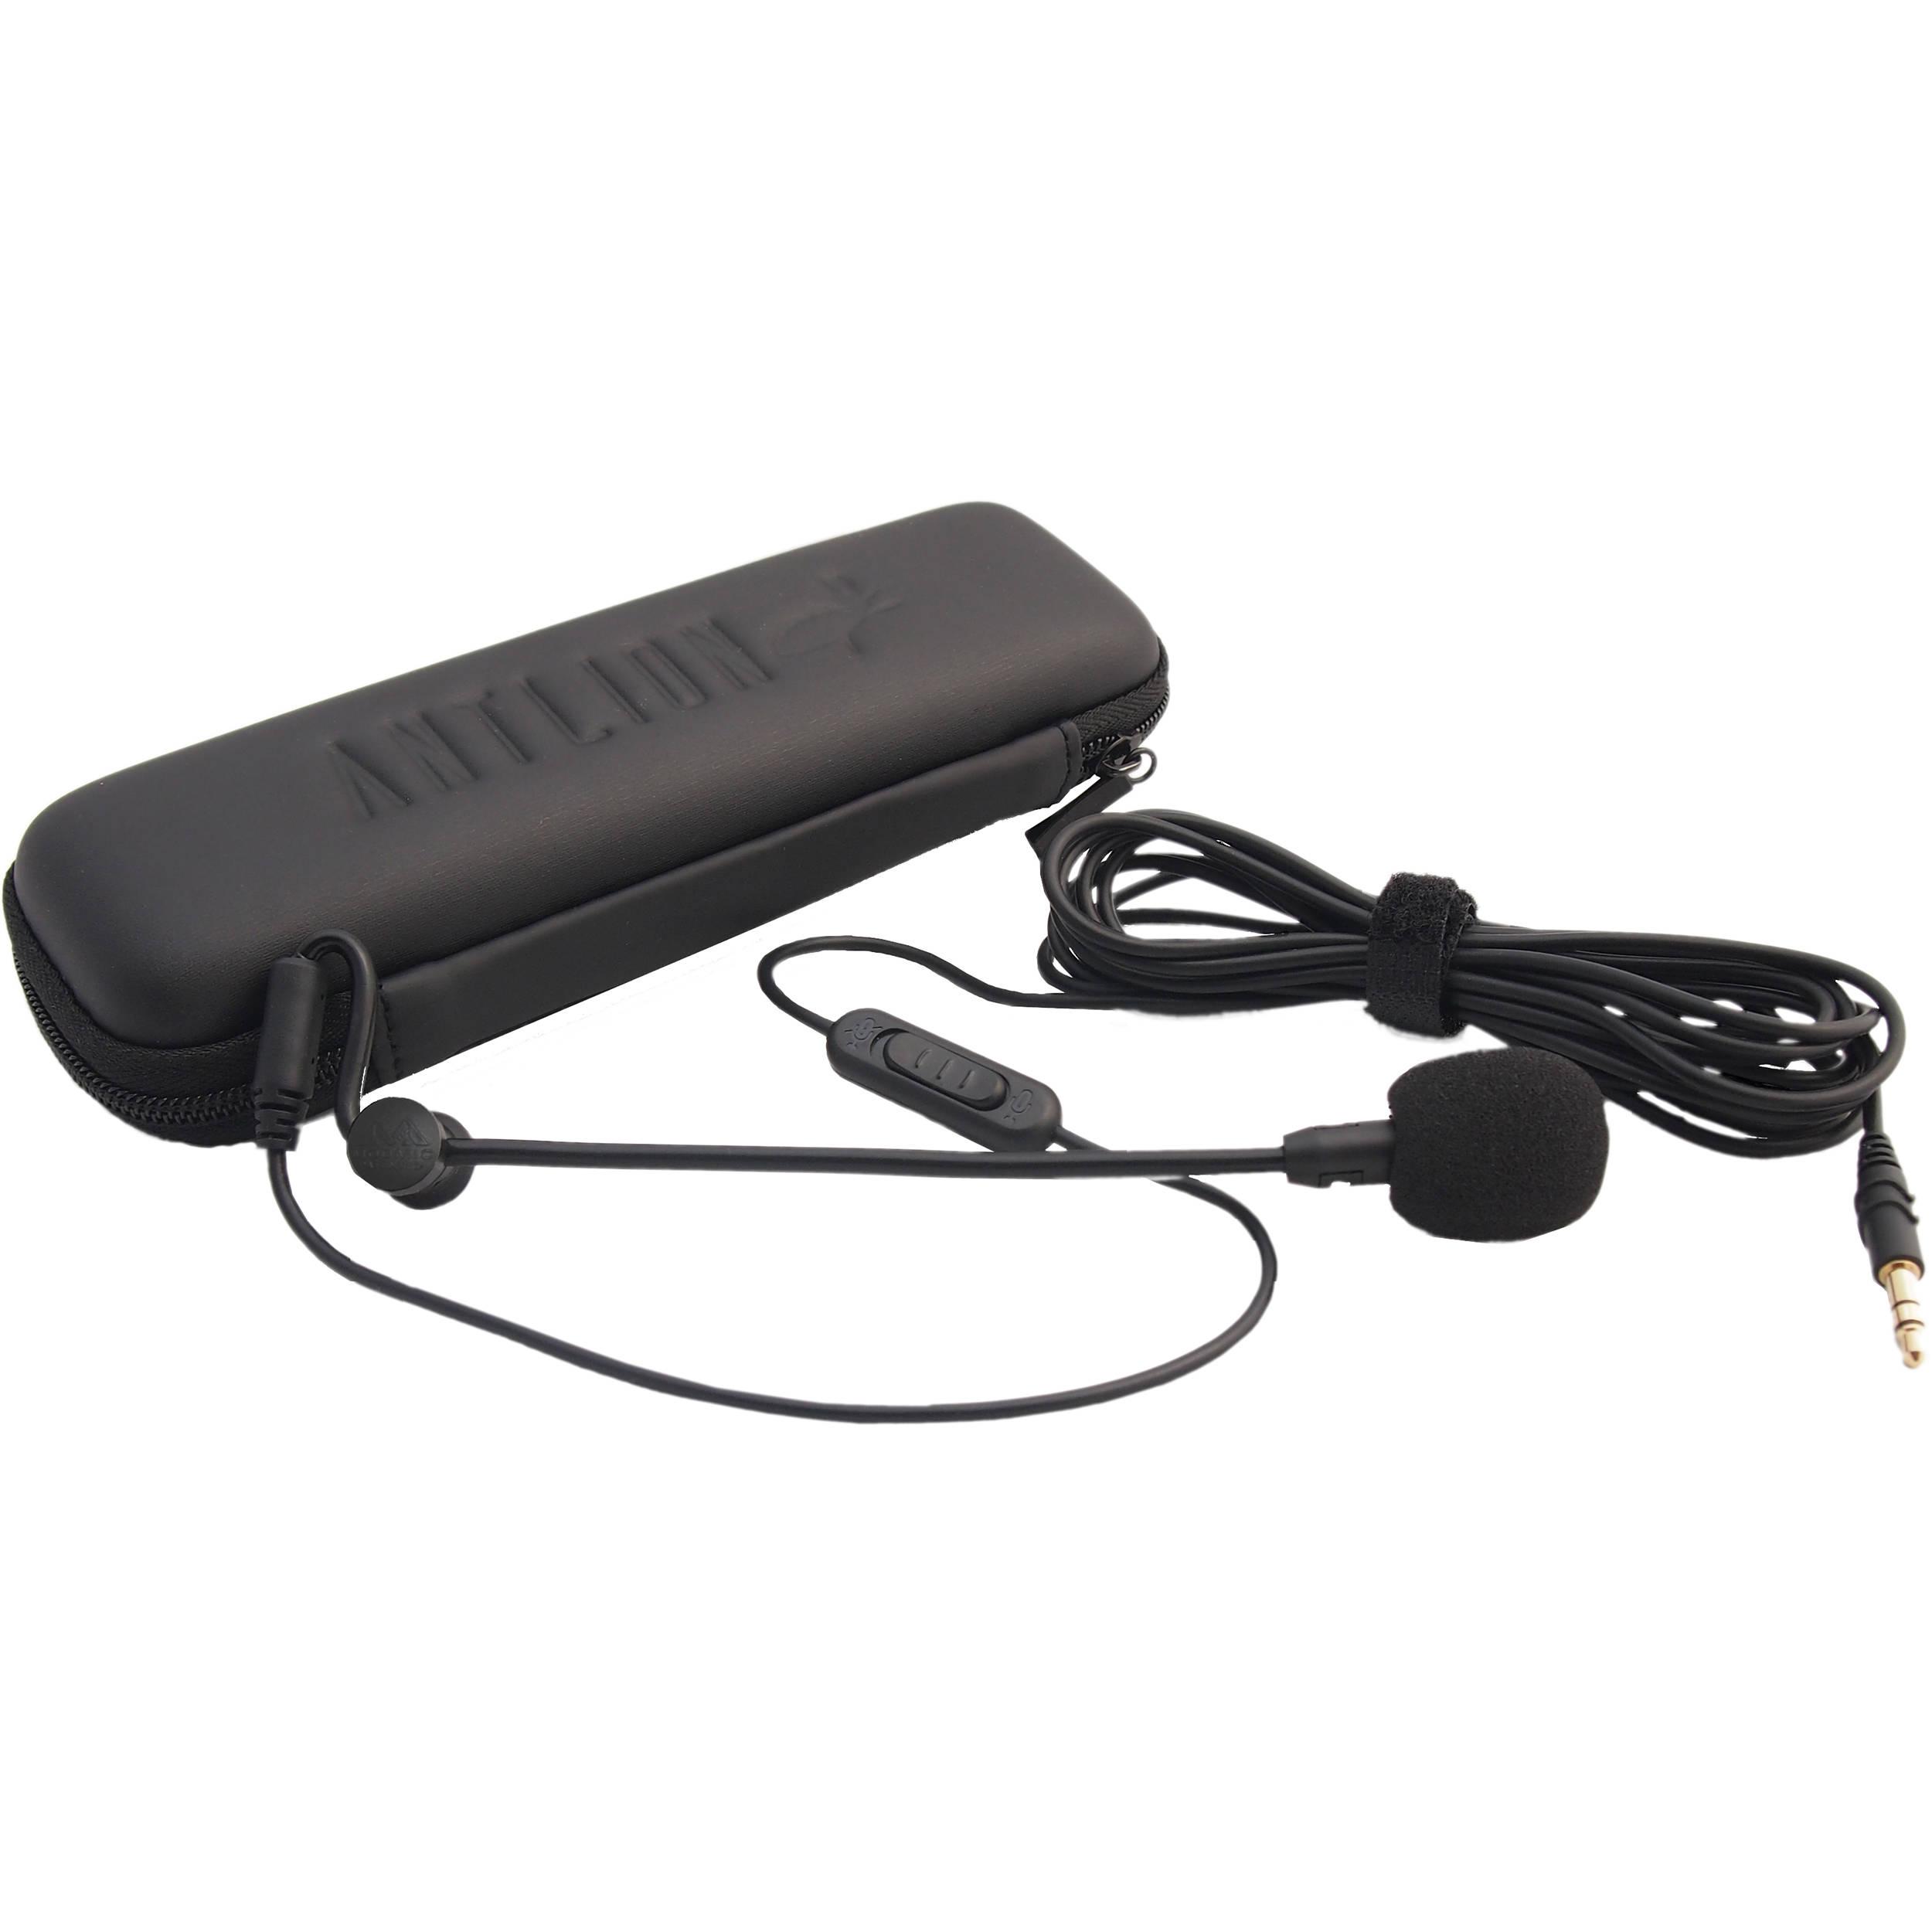 Antlion Audio ModMic 4 0 (Omnidirectional, Mute Button)